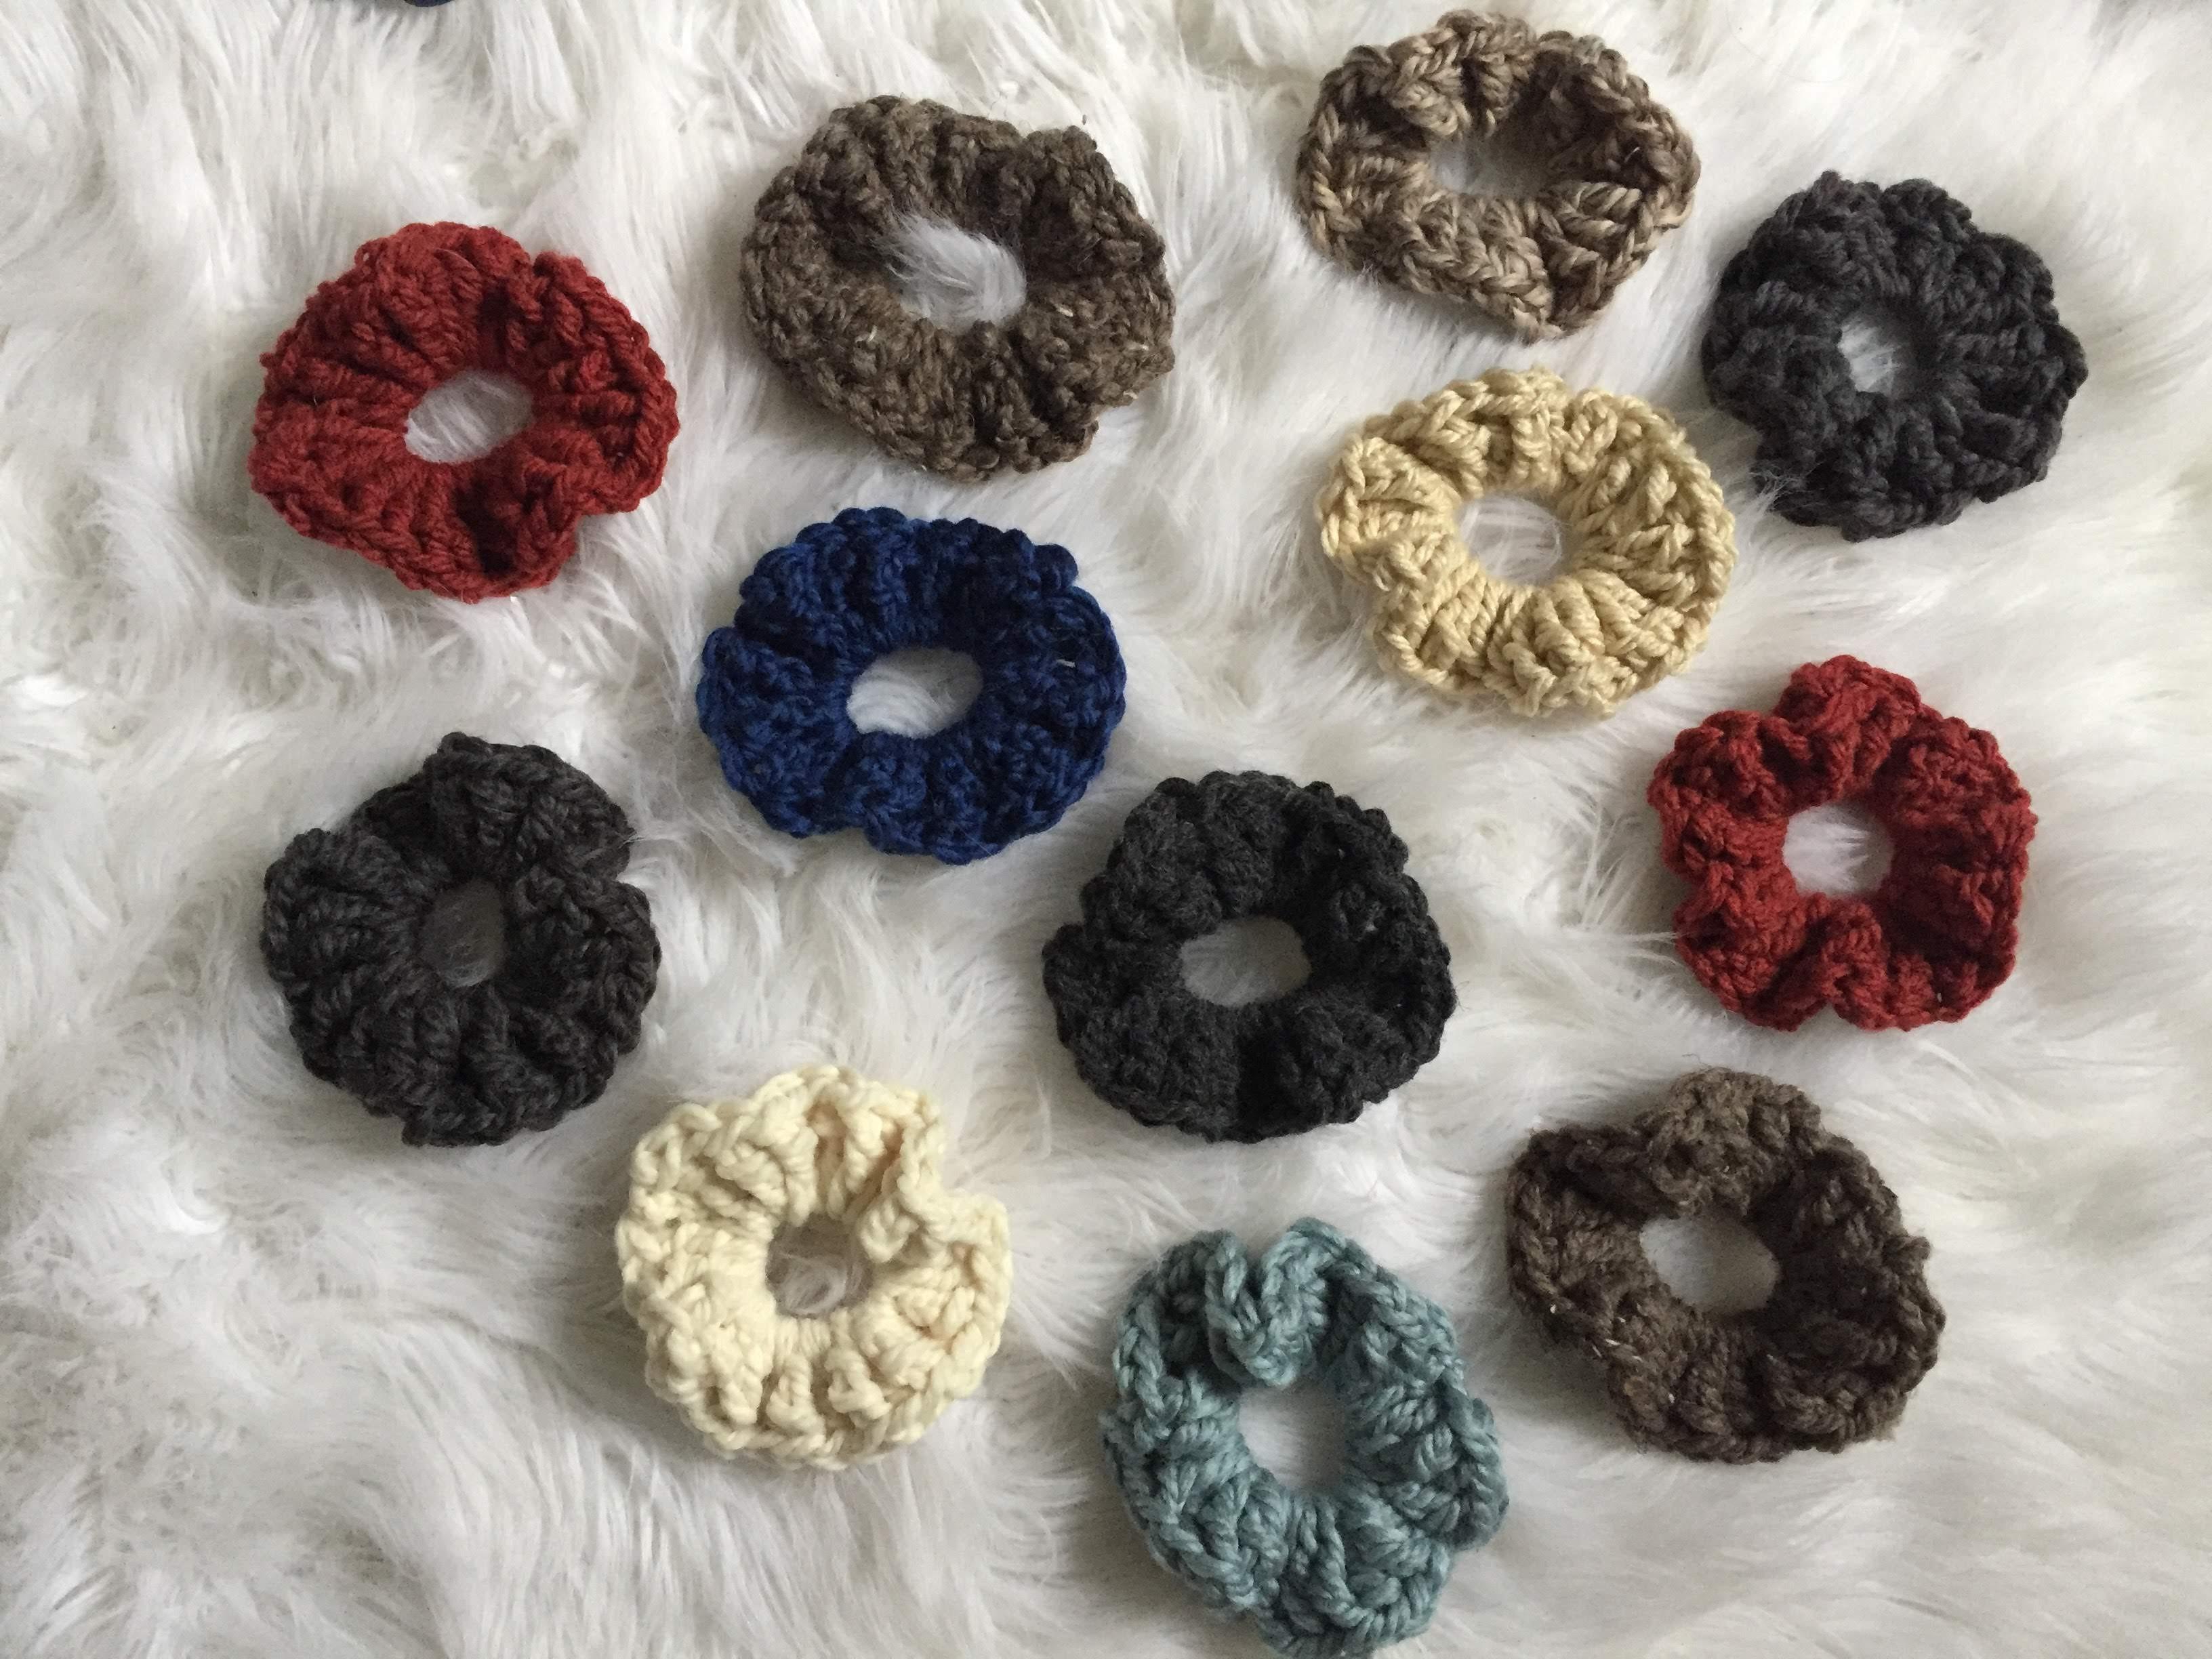 How to Make Crochet Hair Scrunchies